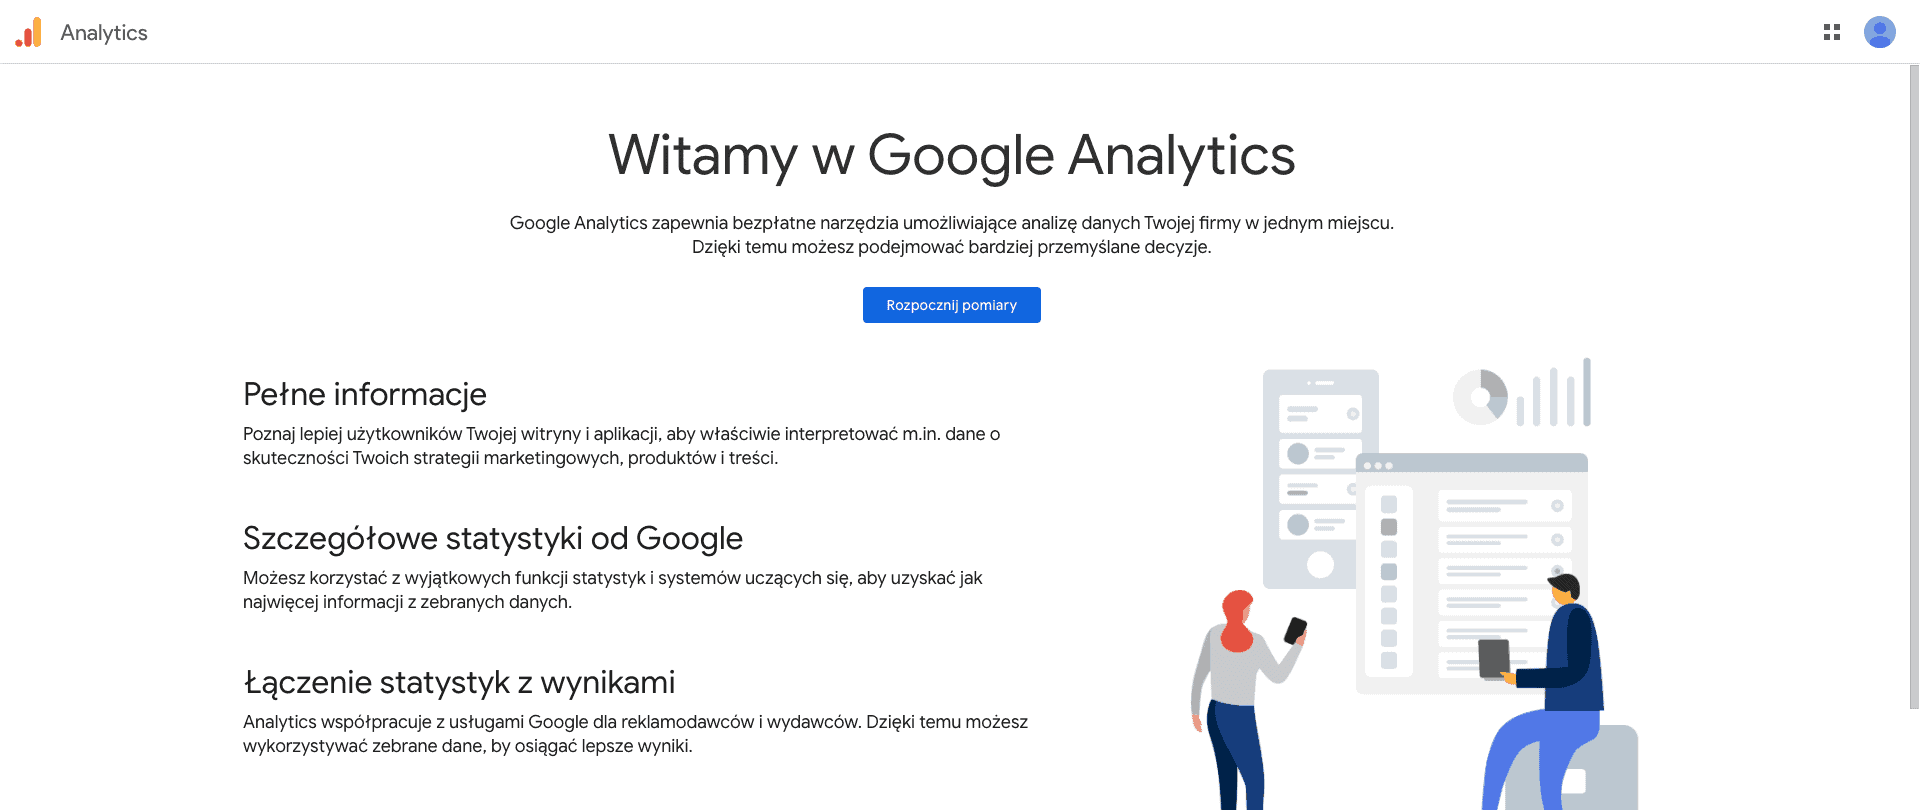 Rejestracja konta Google Analytics